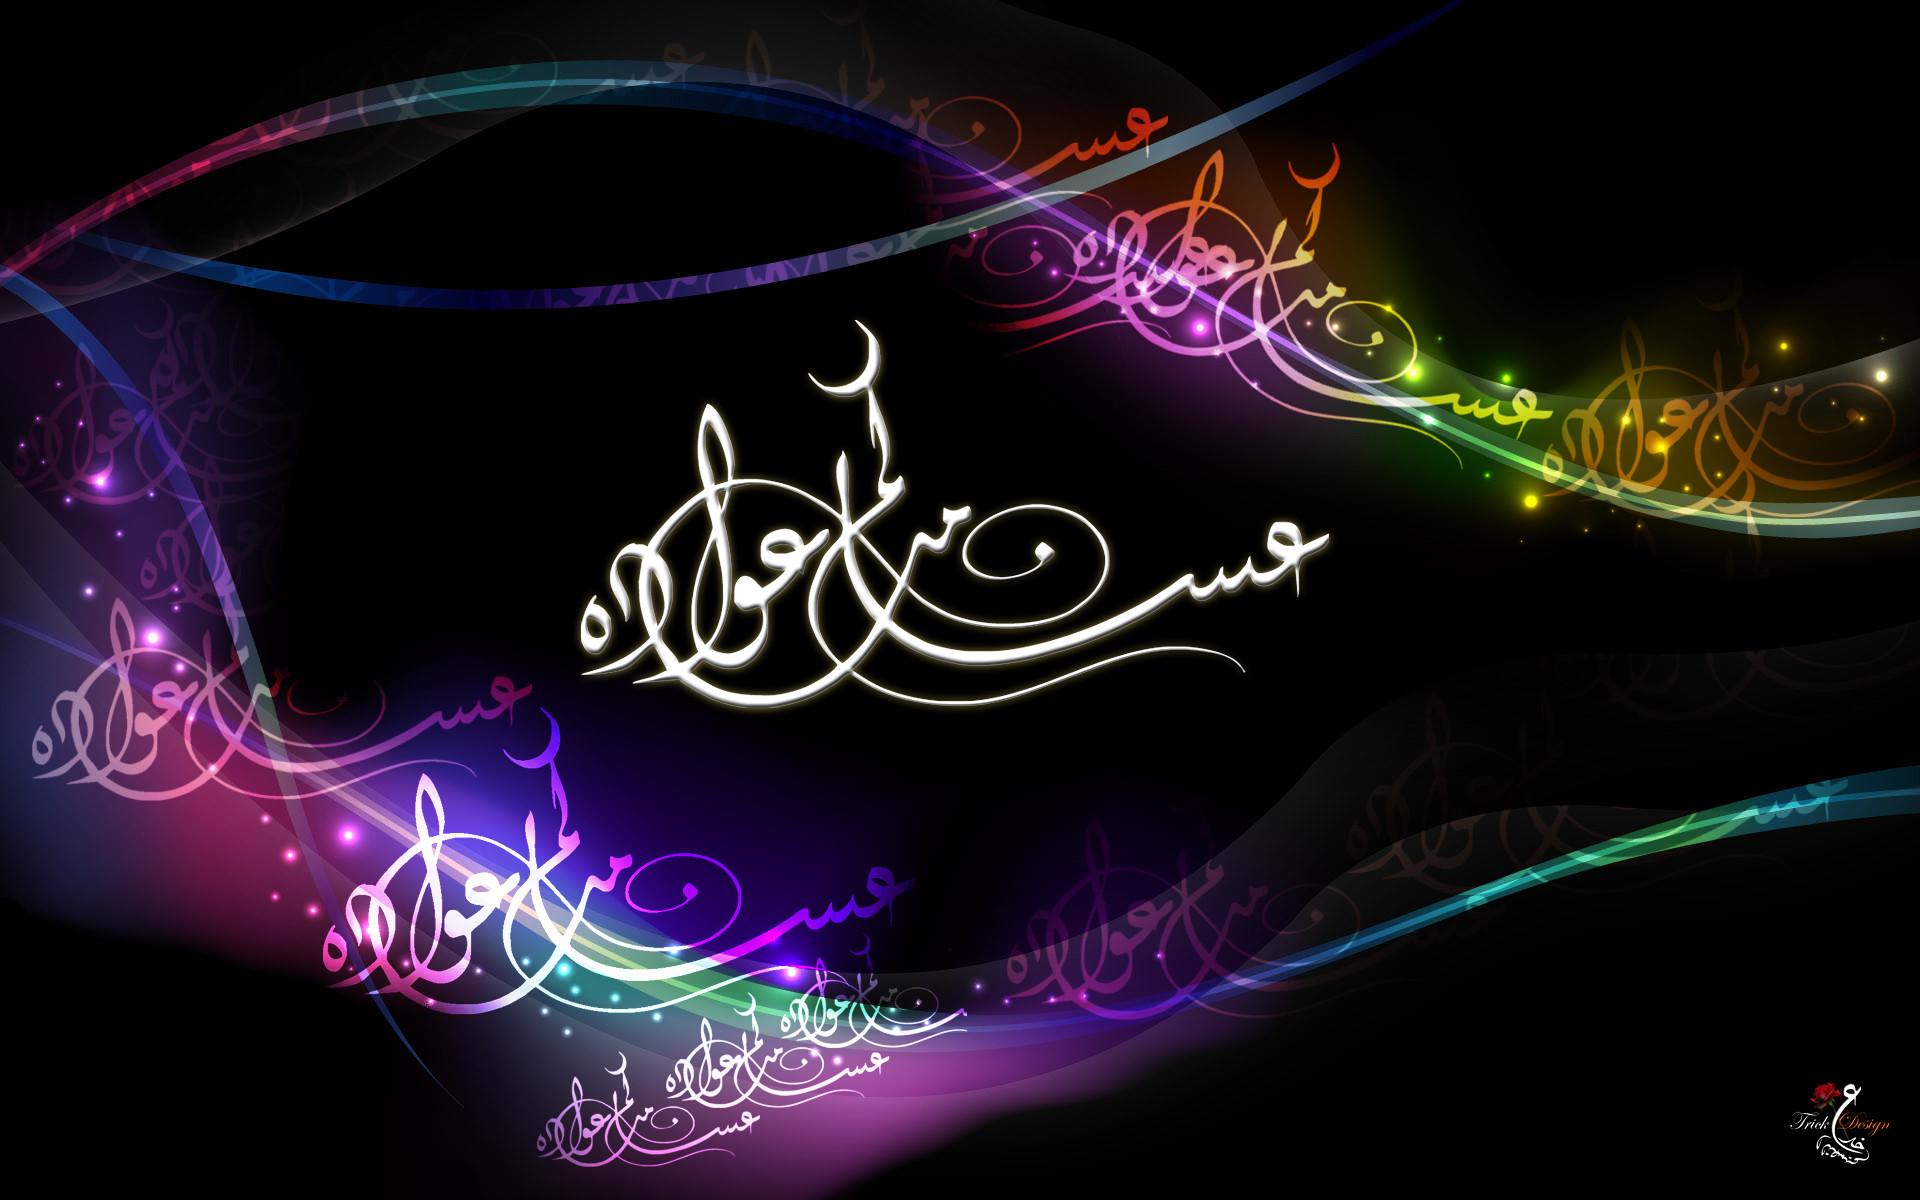 1051340 full size quran wallpaper 1920x1200 mobile